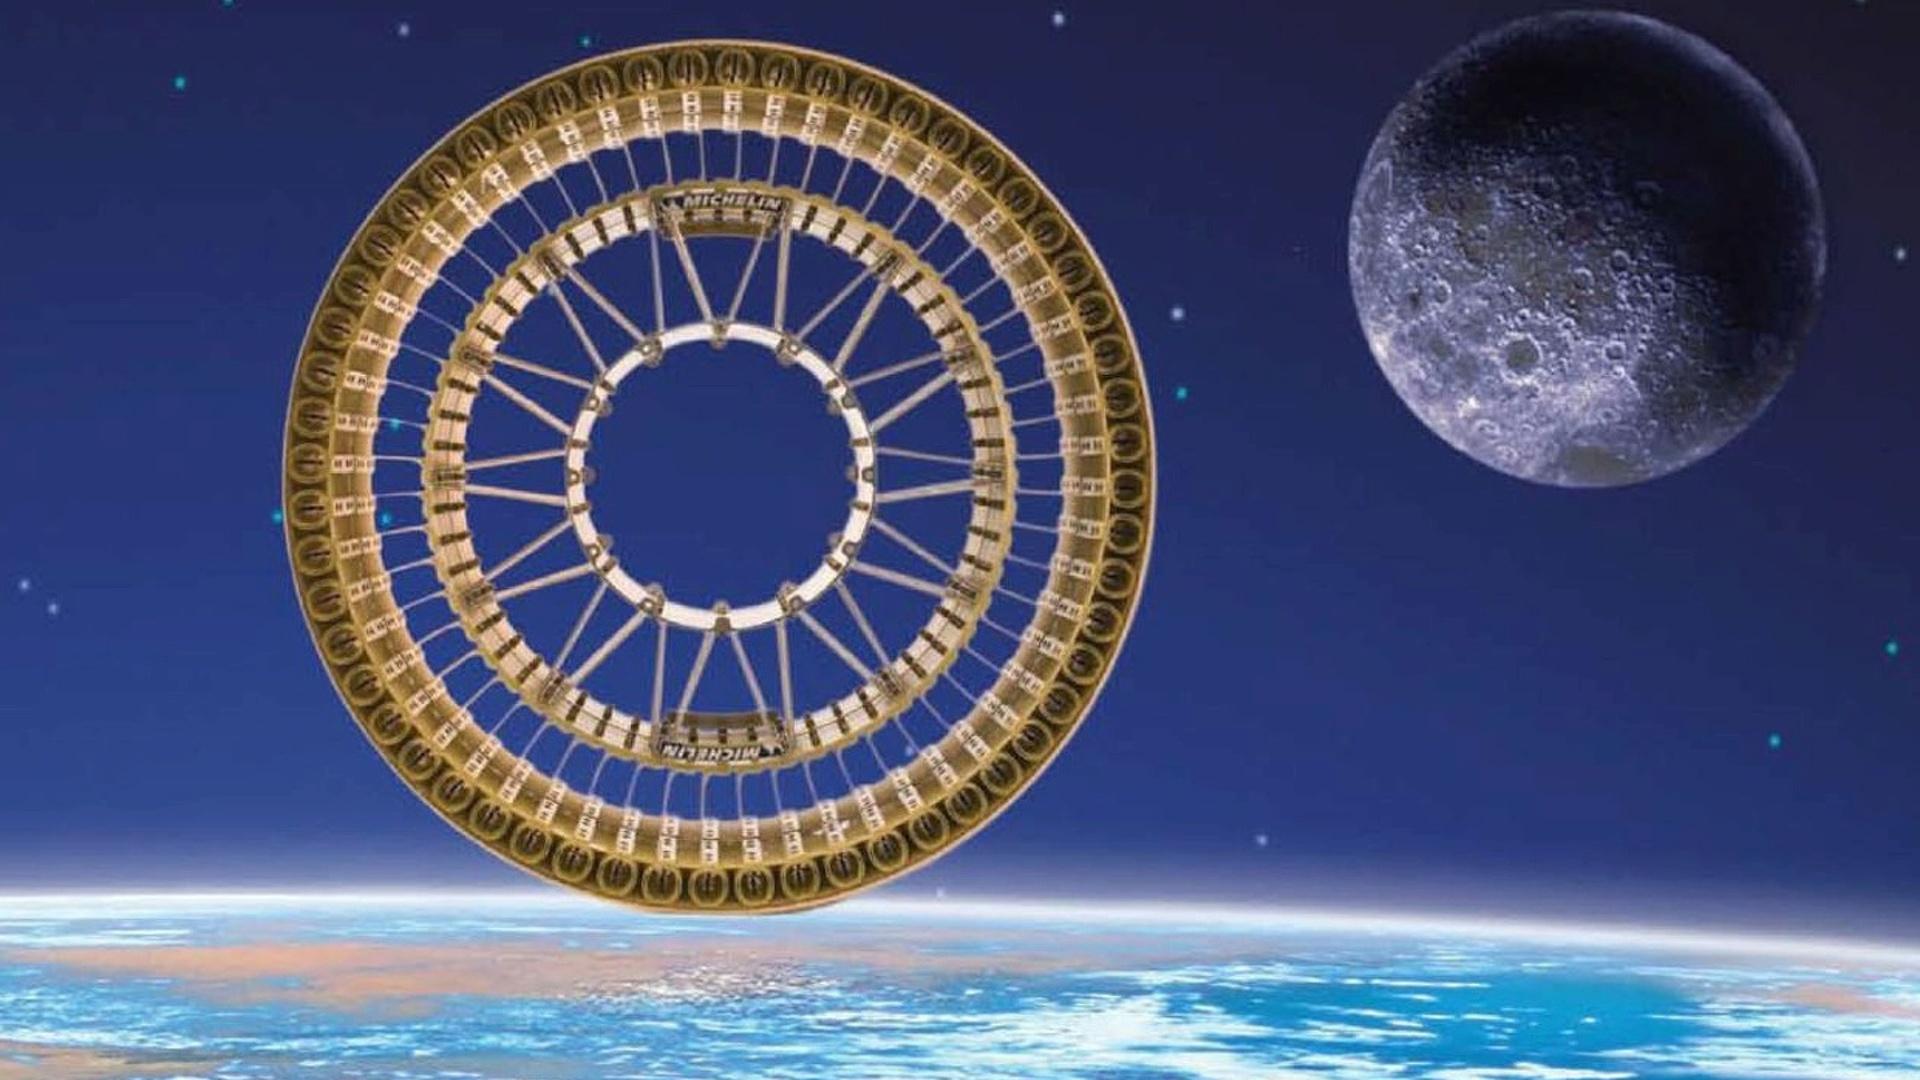 Michelin Develops Lunar Wheel for NASA Moon Rover Vehicles